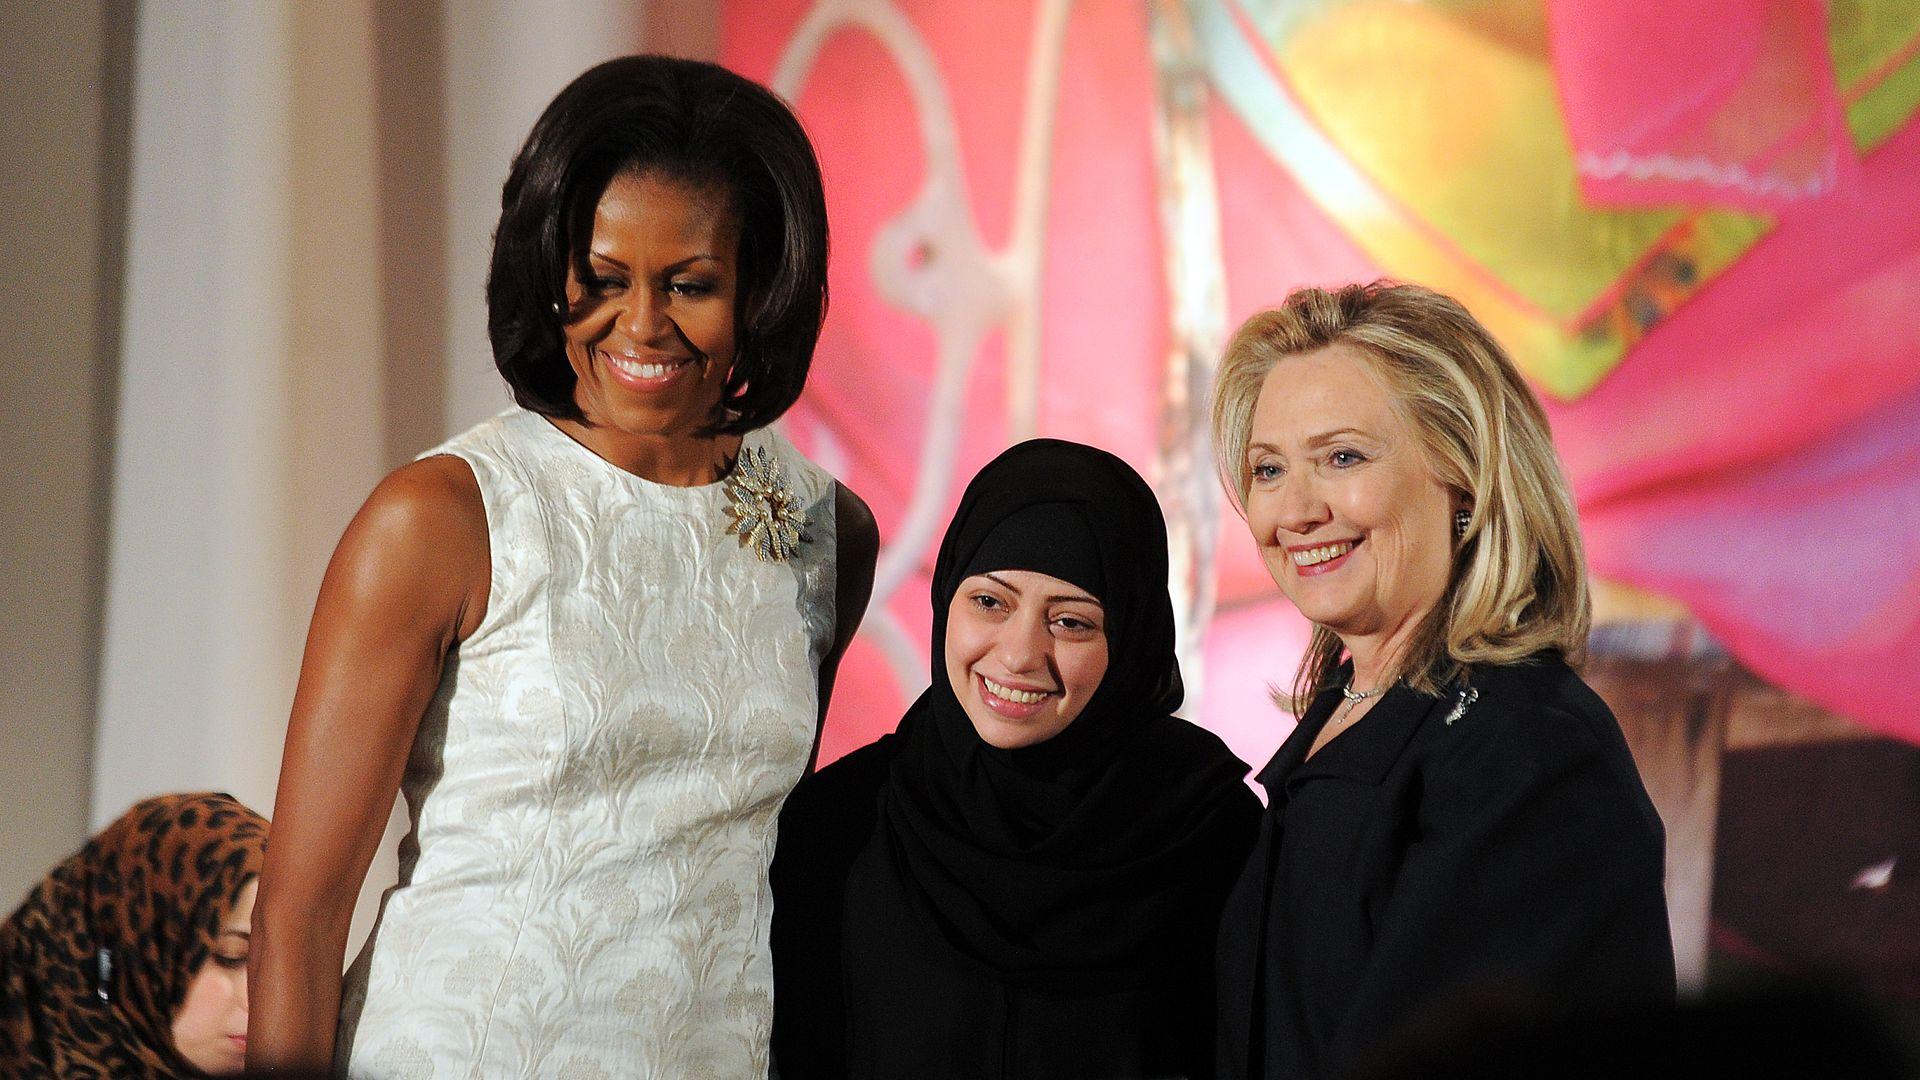 Saudi human rights activist Samar Badawi accepting an award next to Michelle Obama and Hillary Clinton